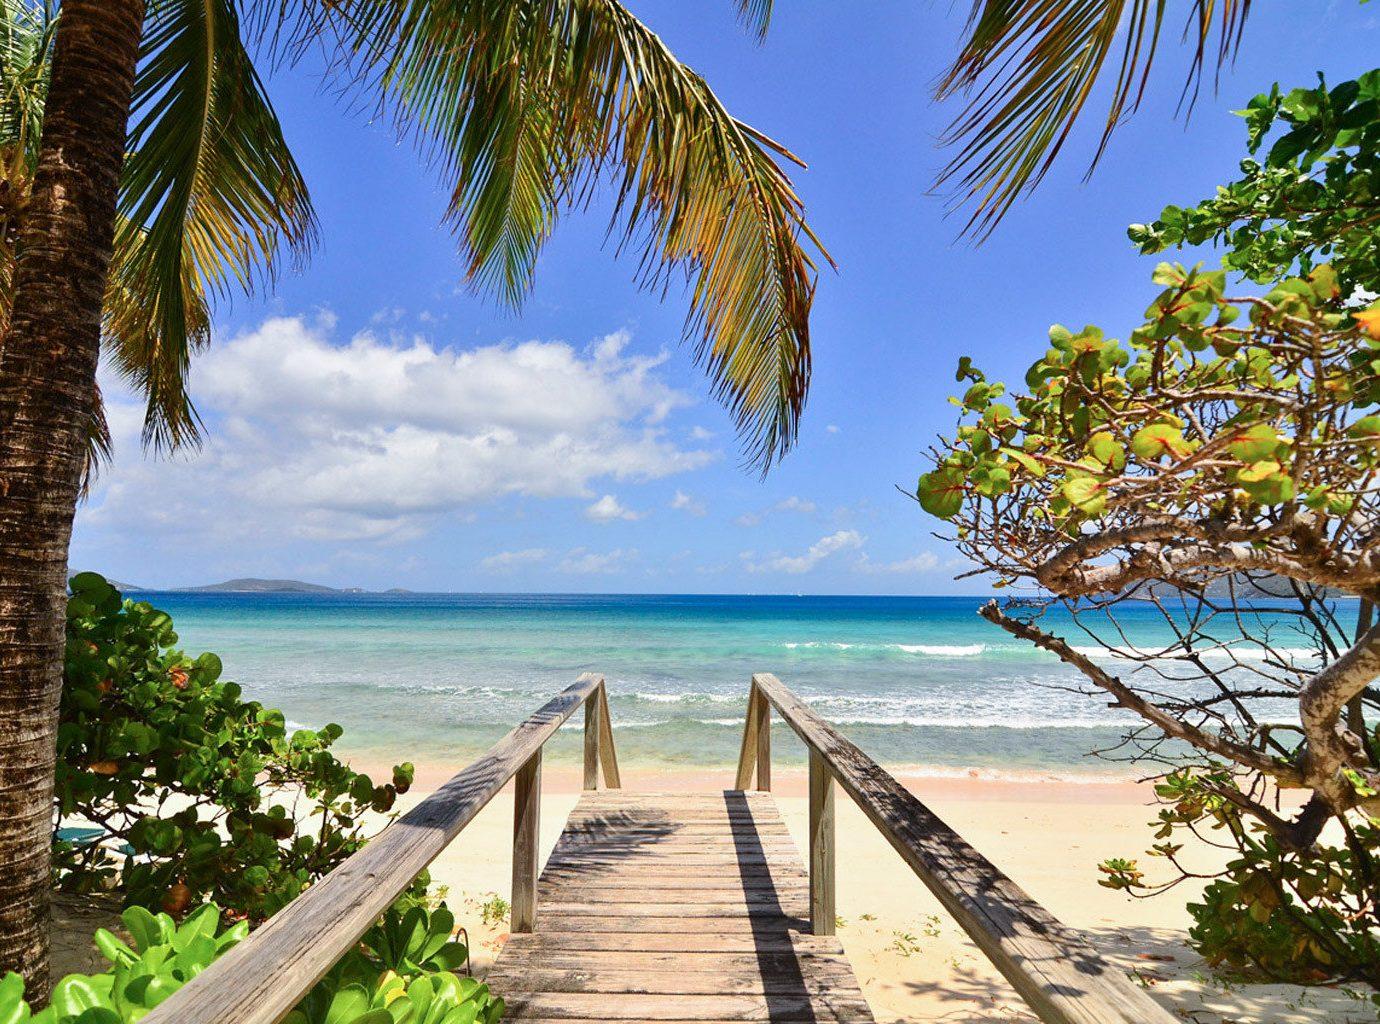 Beach Beachfront Luxury Ocean tree water sky palm plant caribbean tropics Sea Coast arecales Resort palm family Jungle overlooking lined shore sandy